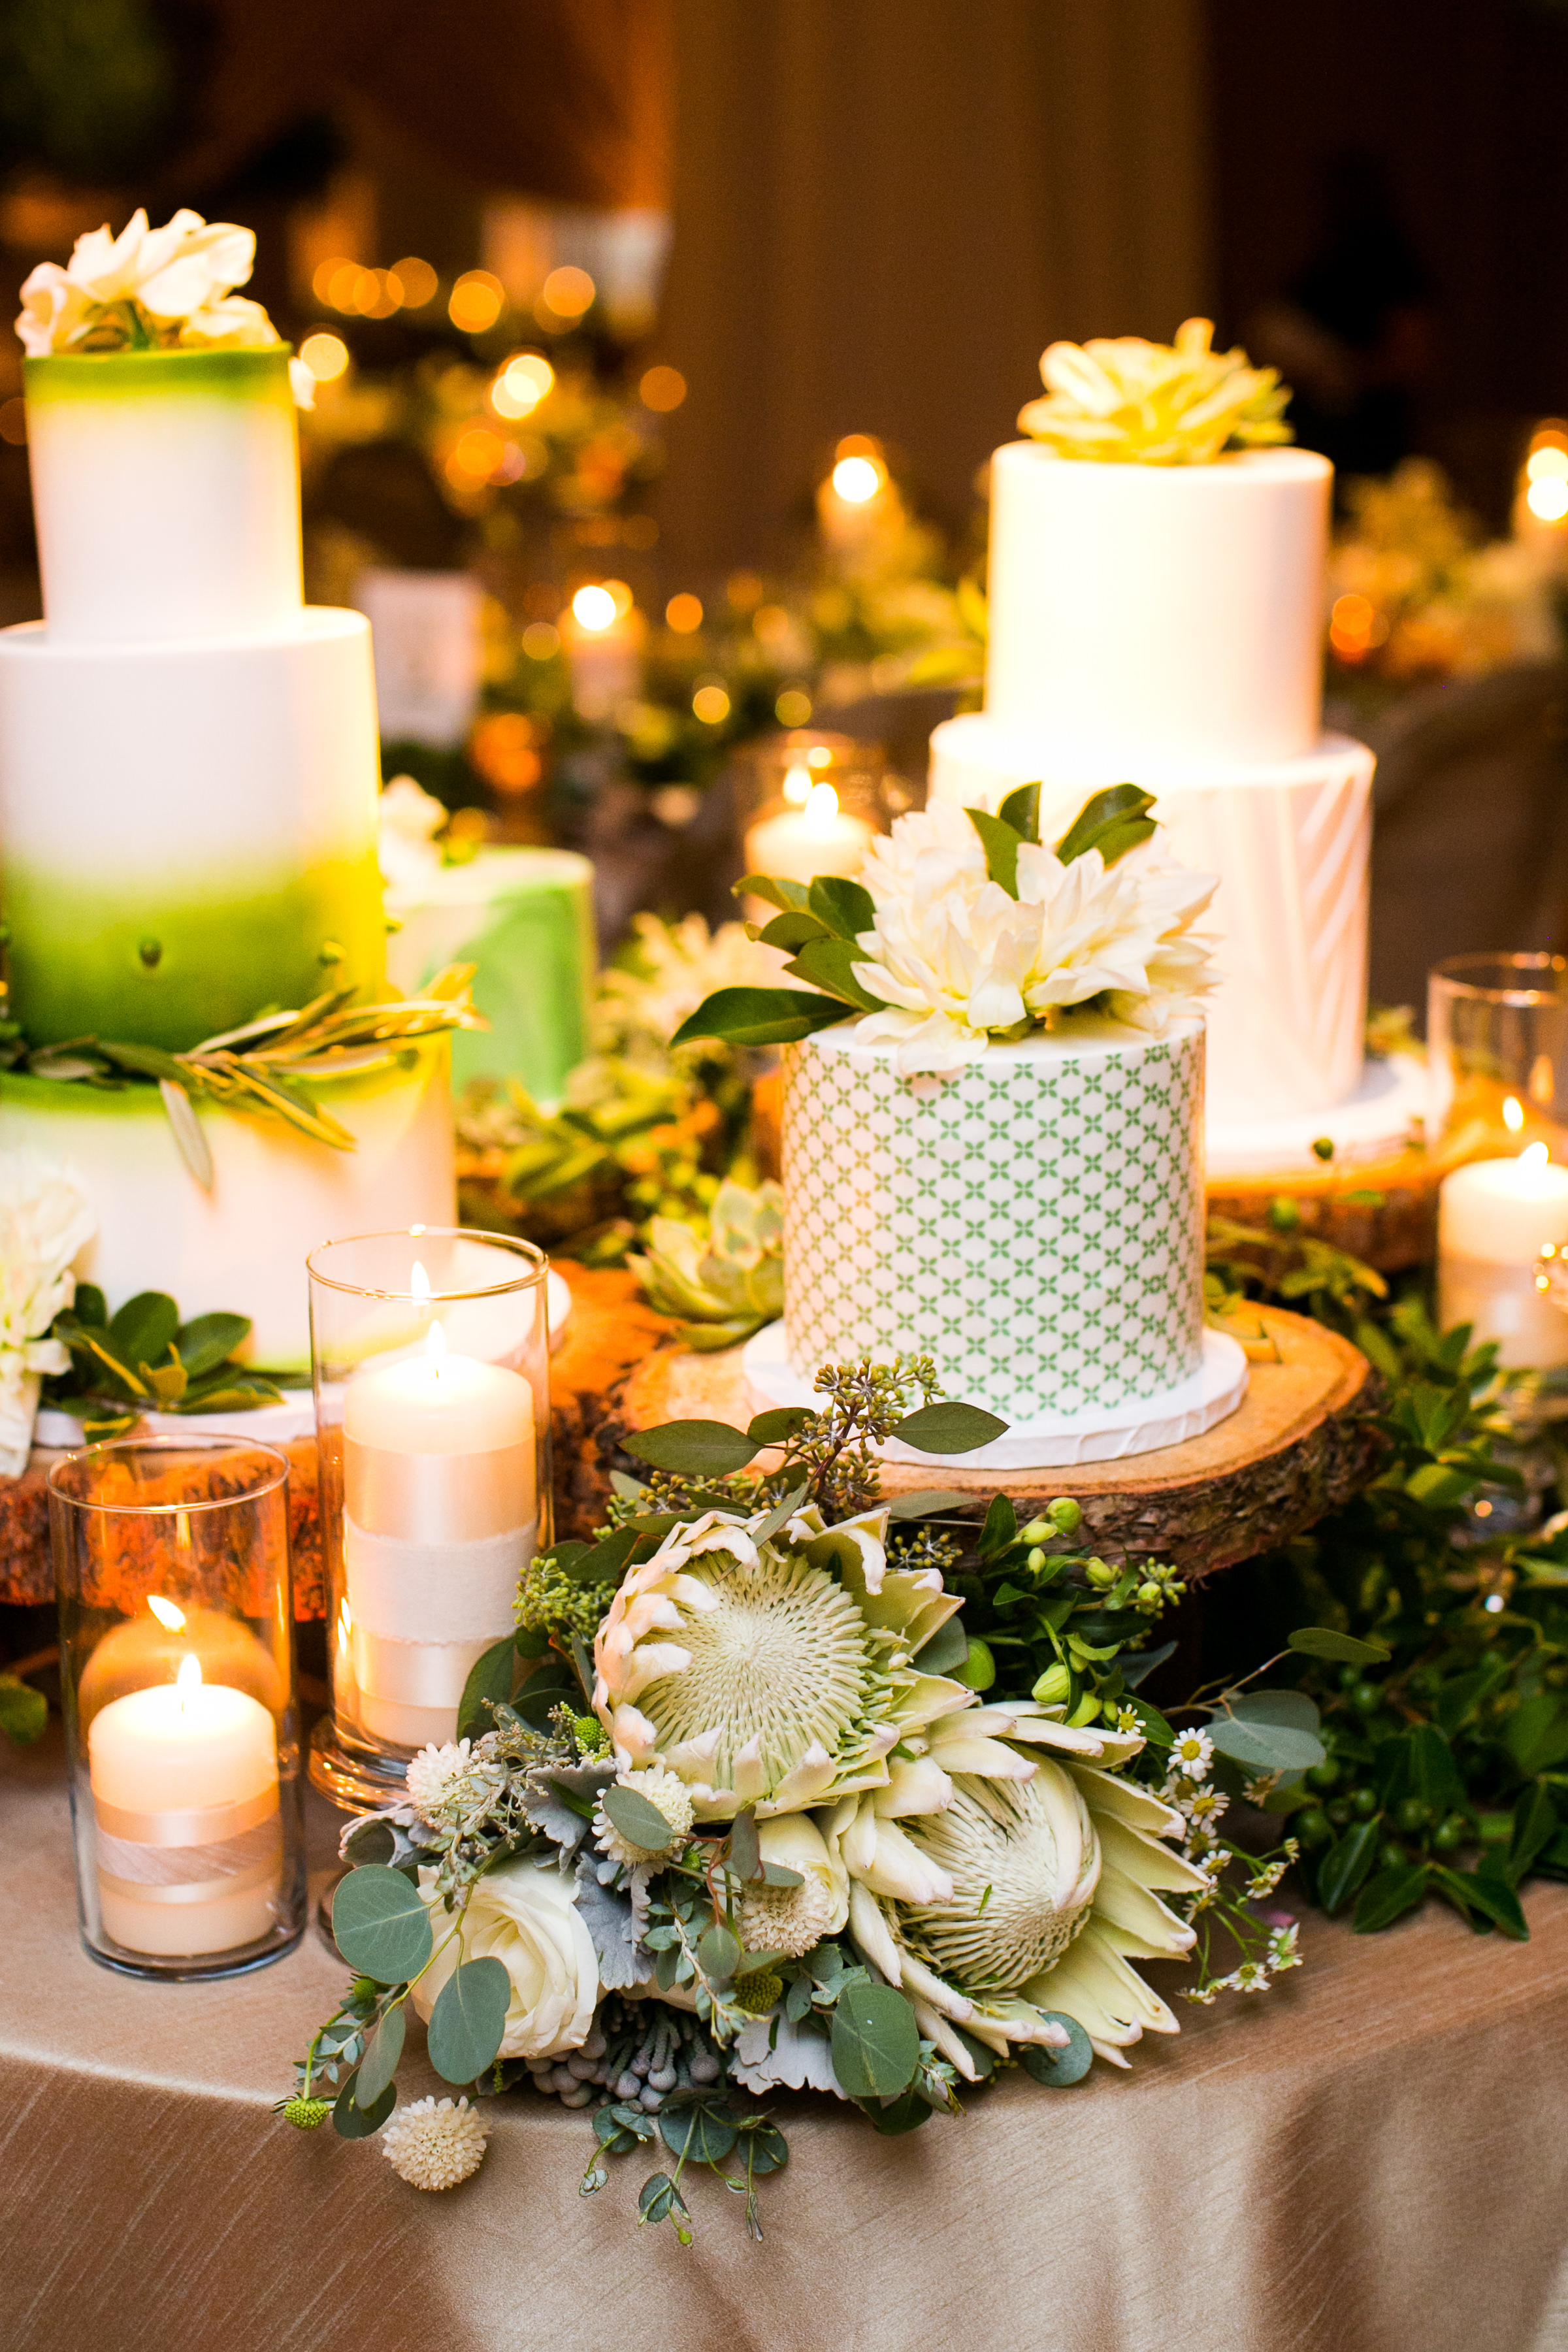 www.santabarbarawedding.com   Four Seasons Santa Barbara   Levine Fox Events   Callaway Gable Photo   Wedding Cakes